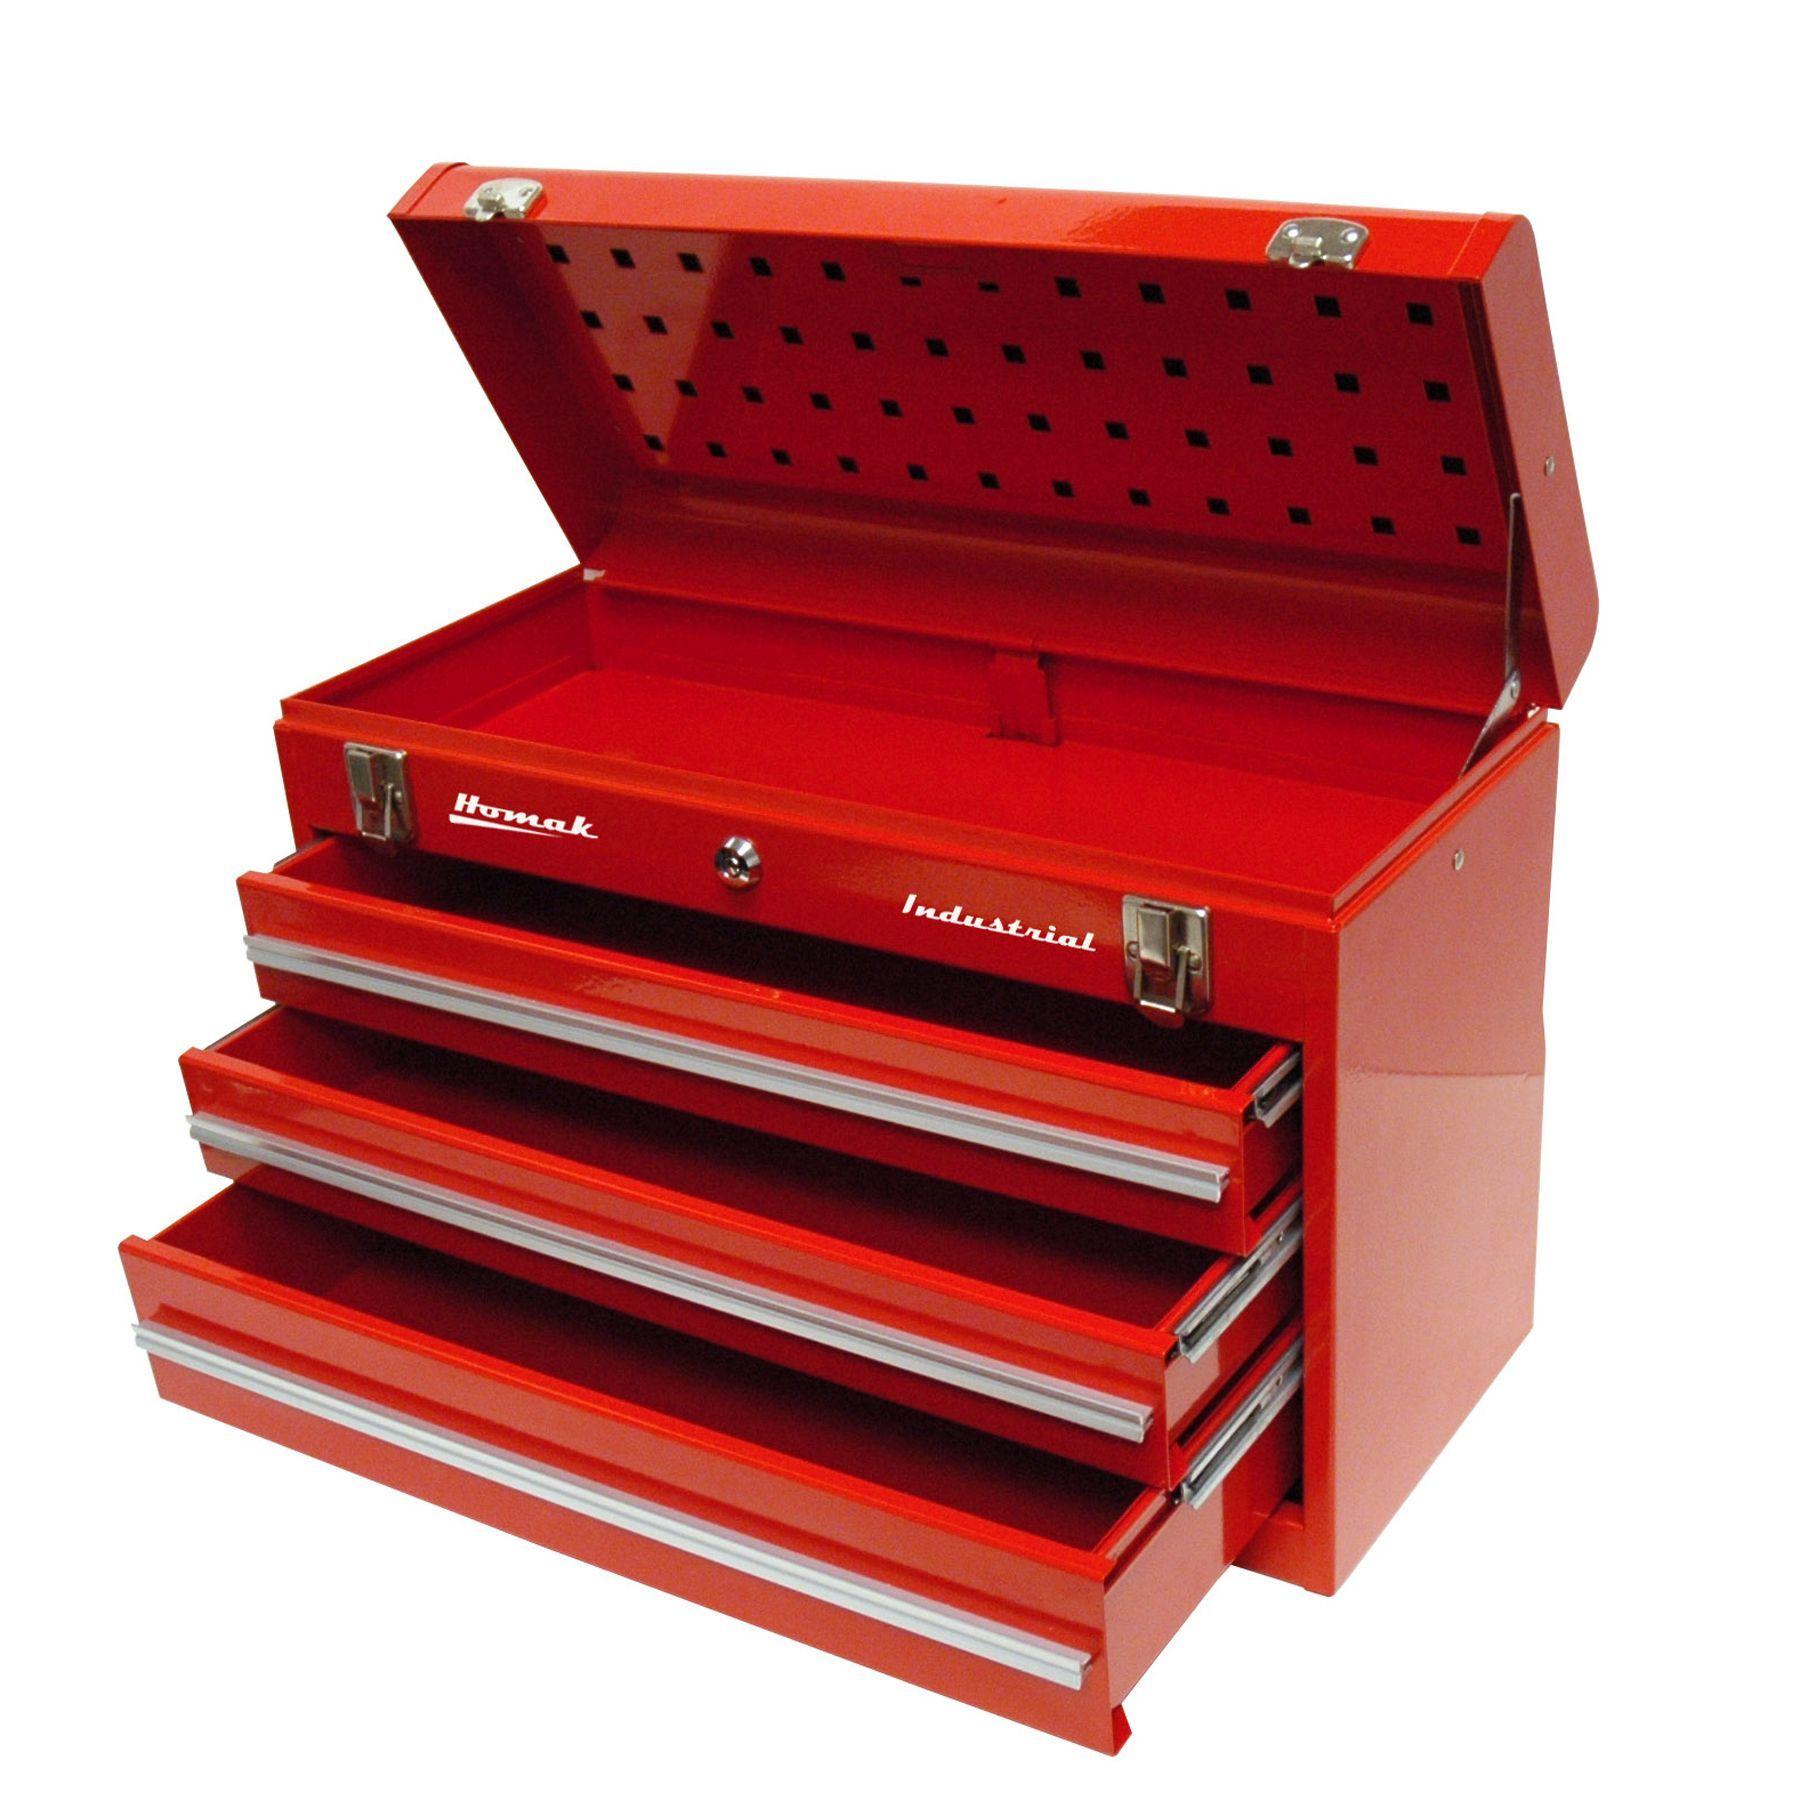 Childrens Animals Storage Box Chest 3 Kids Drawer Bedroom: Homak 20in 3 Drawer Friction Toolbox